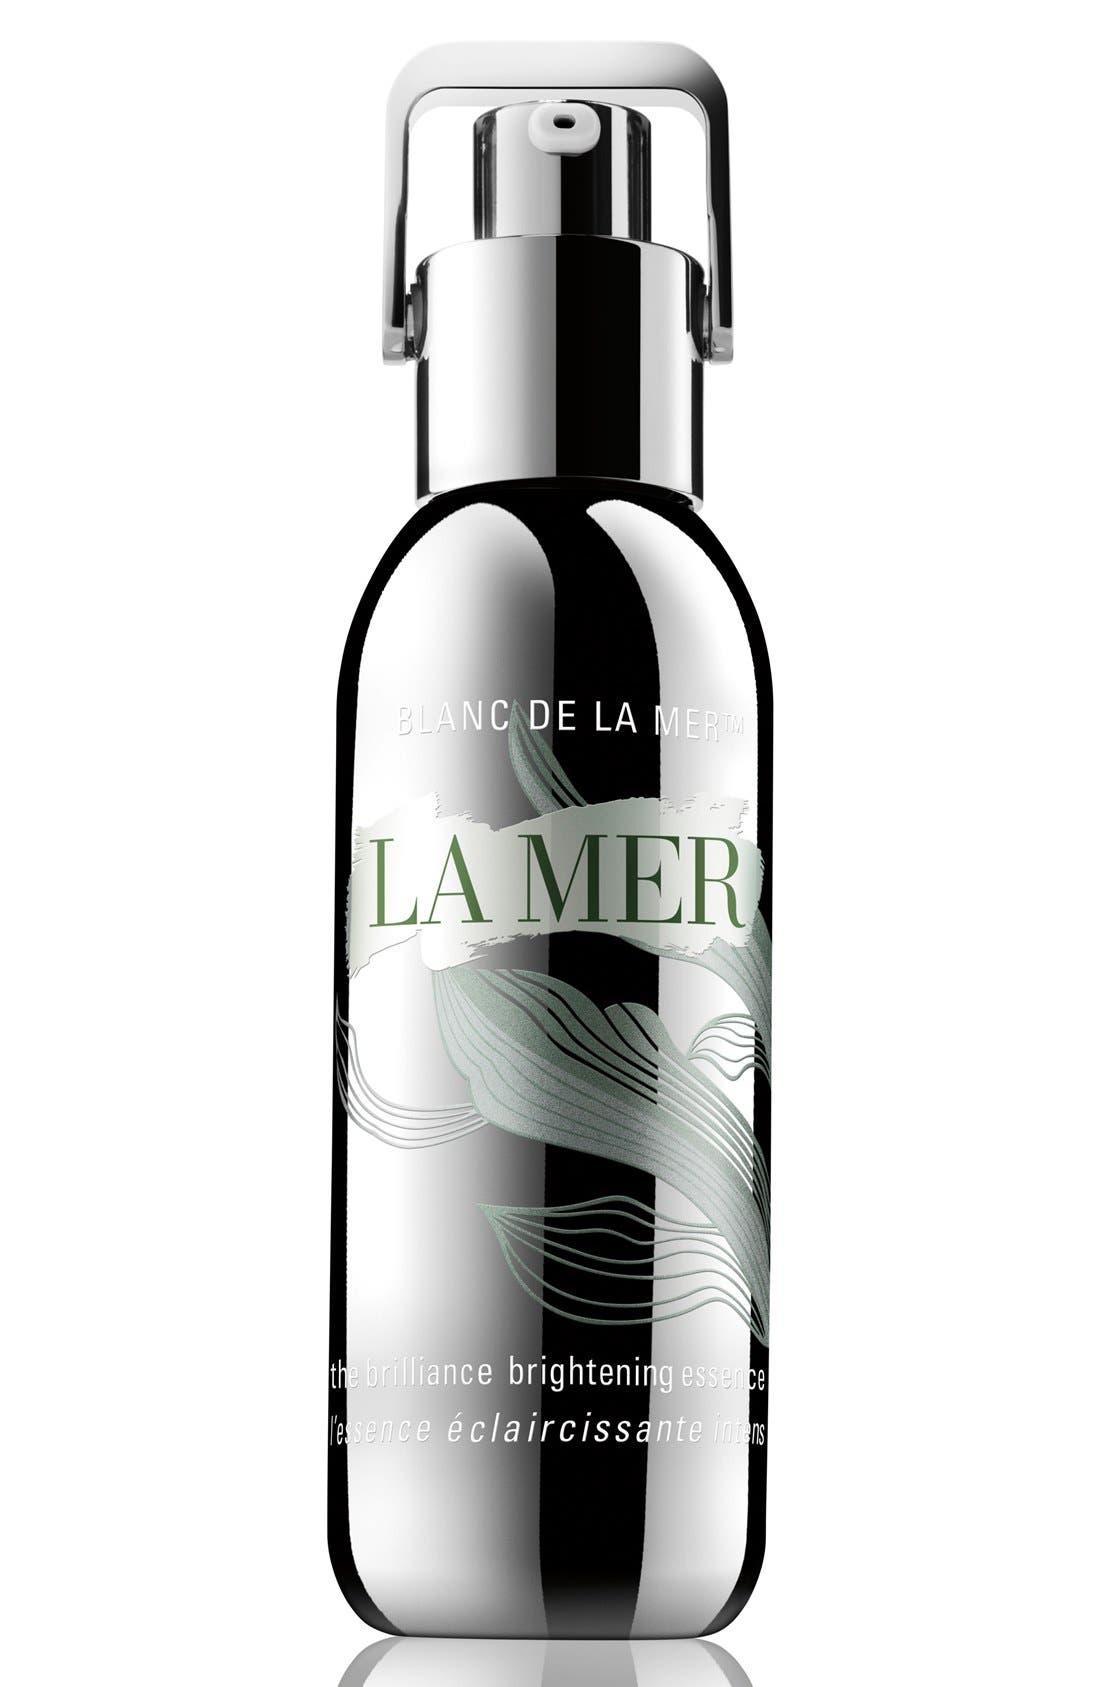 La Mer 'The Brilliance Brightening Essence' Serum